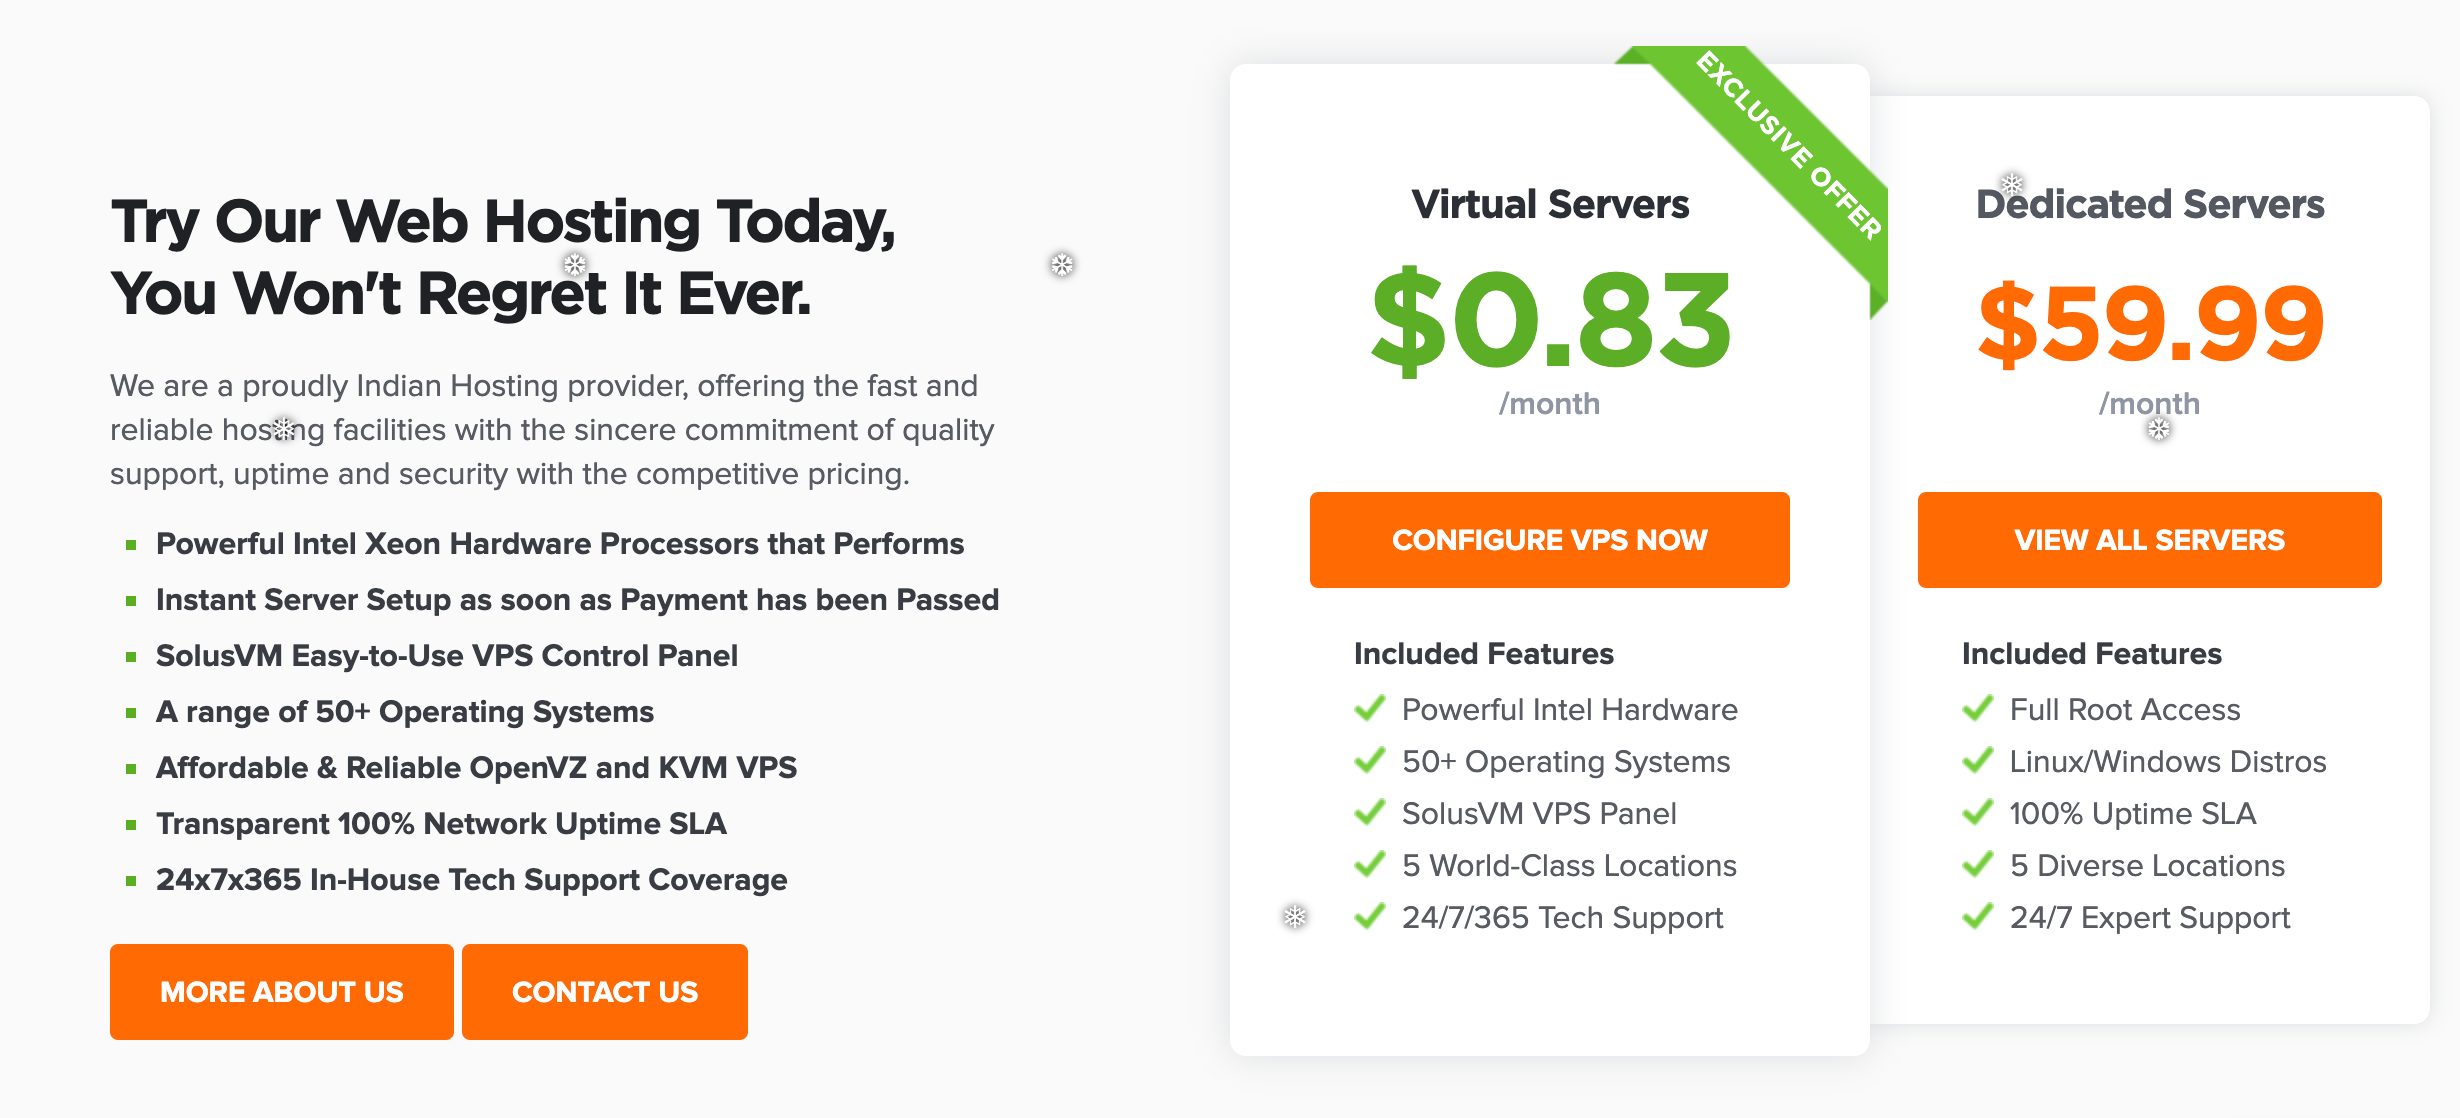 HostNamaste Virtual Servers